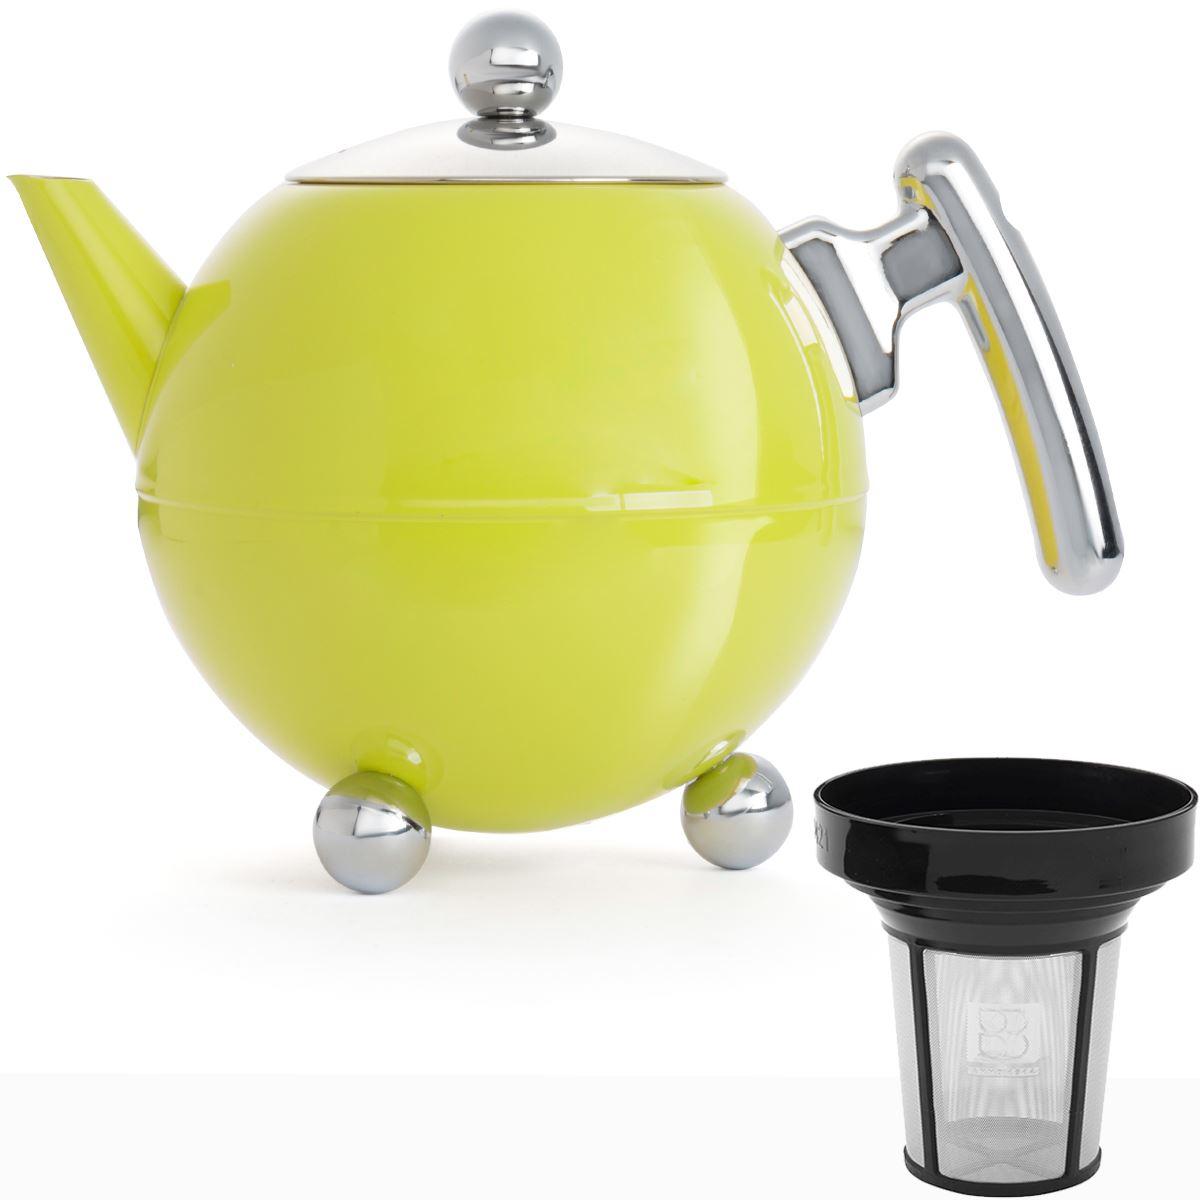 teekanne teebereiter 1 2 liter gelb kanne mit sieb teesieb teefilter edelstahl ebay. Black Bedroom Furniture Sets. Home Design Ideas